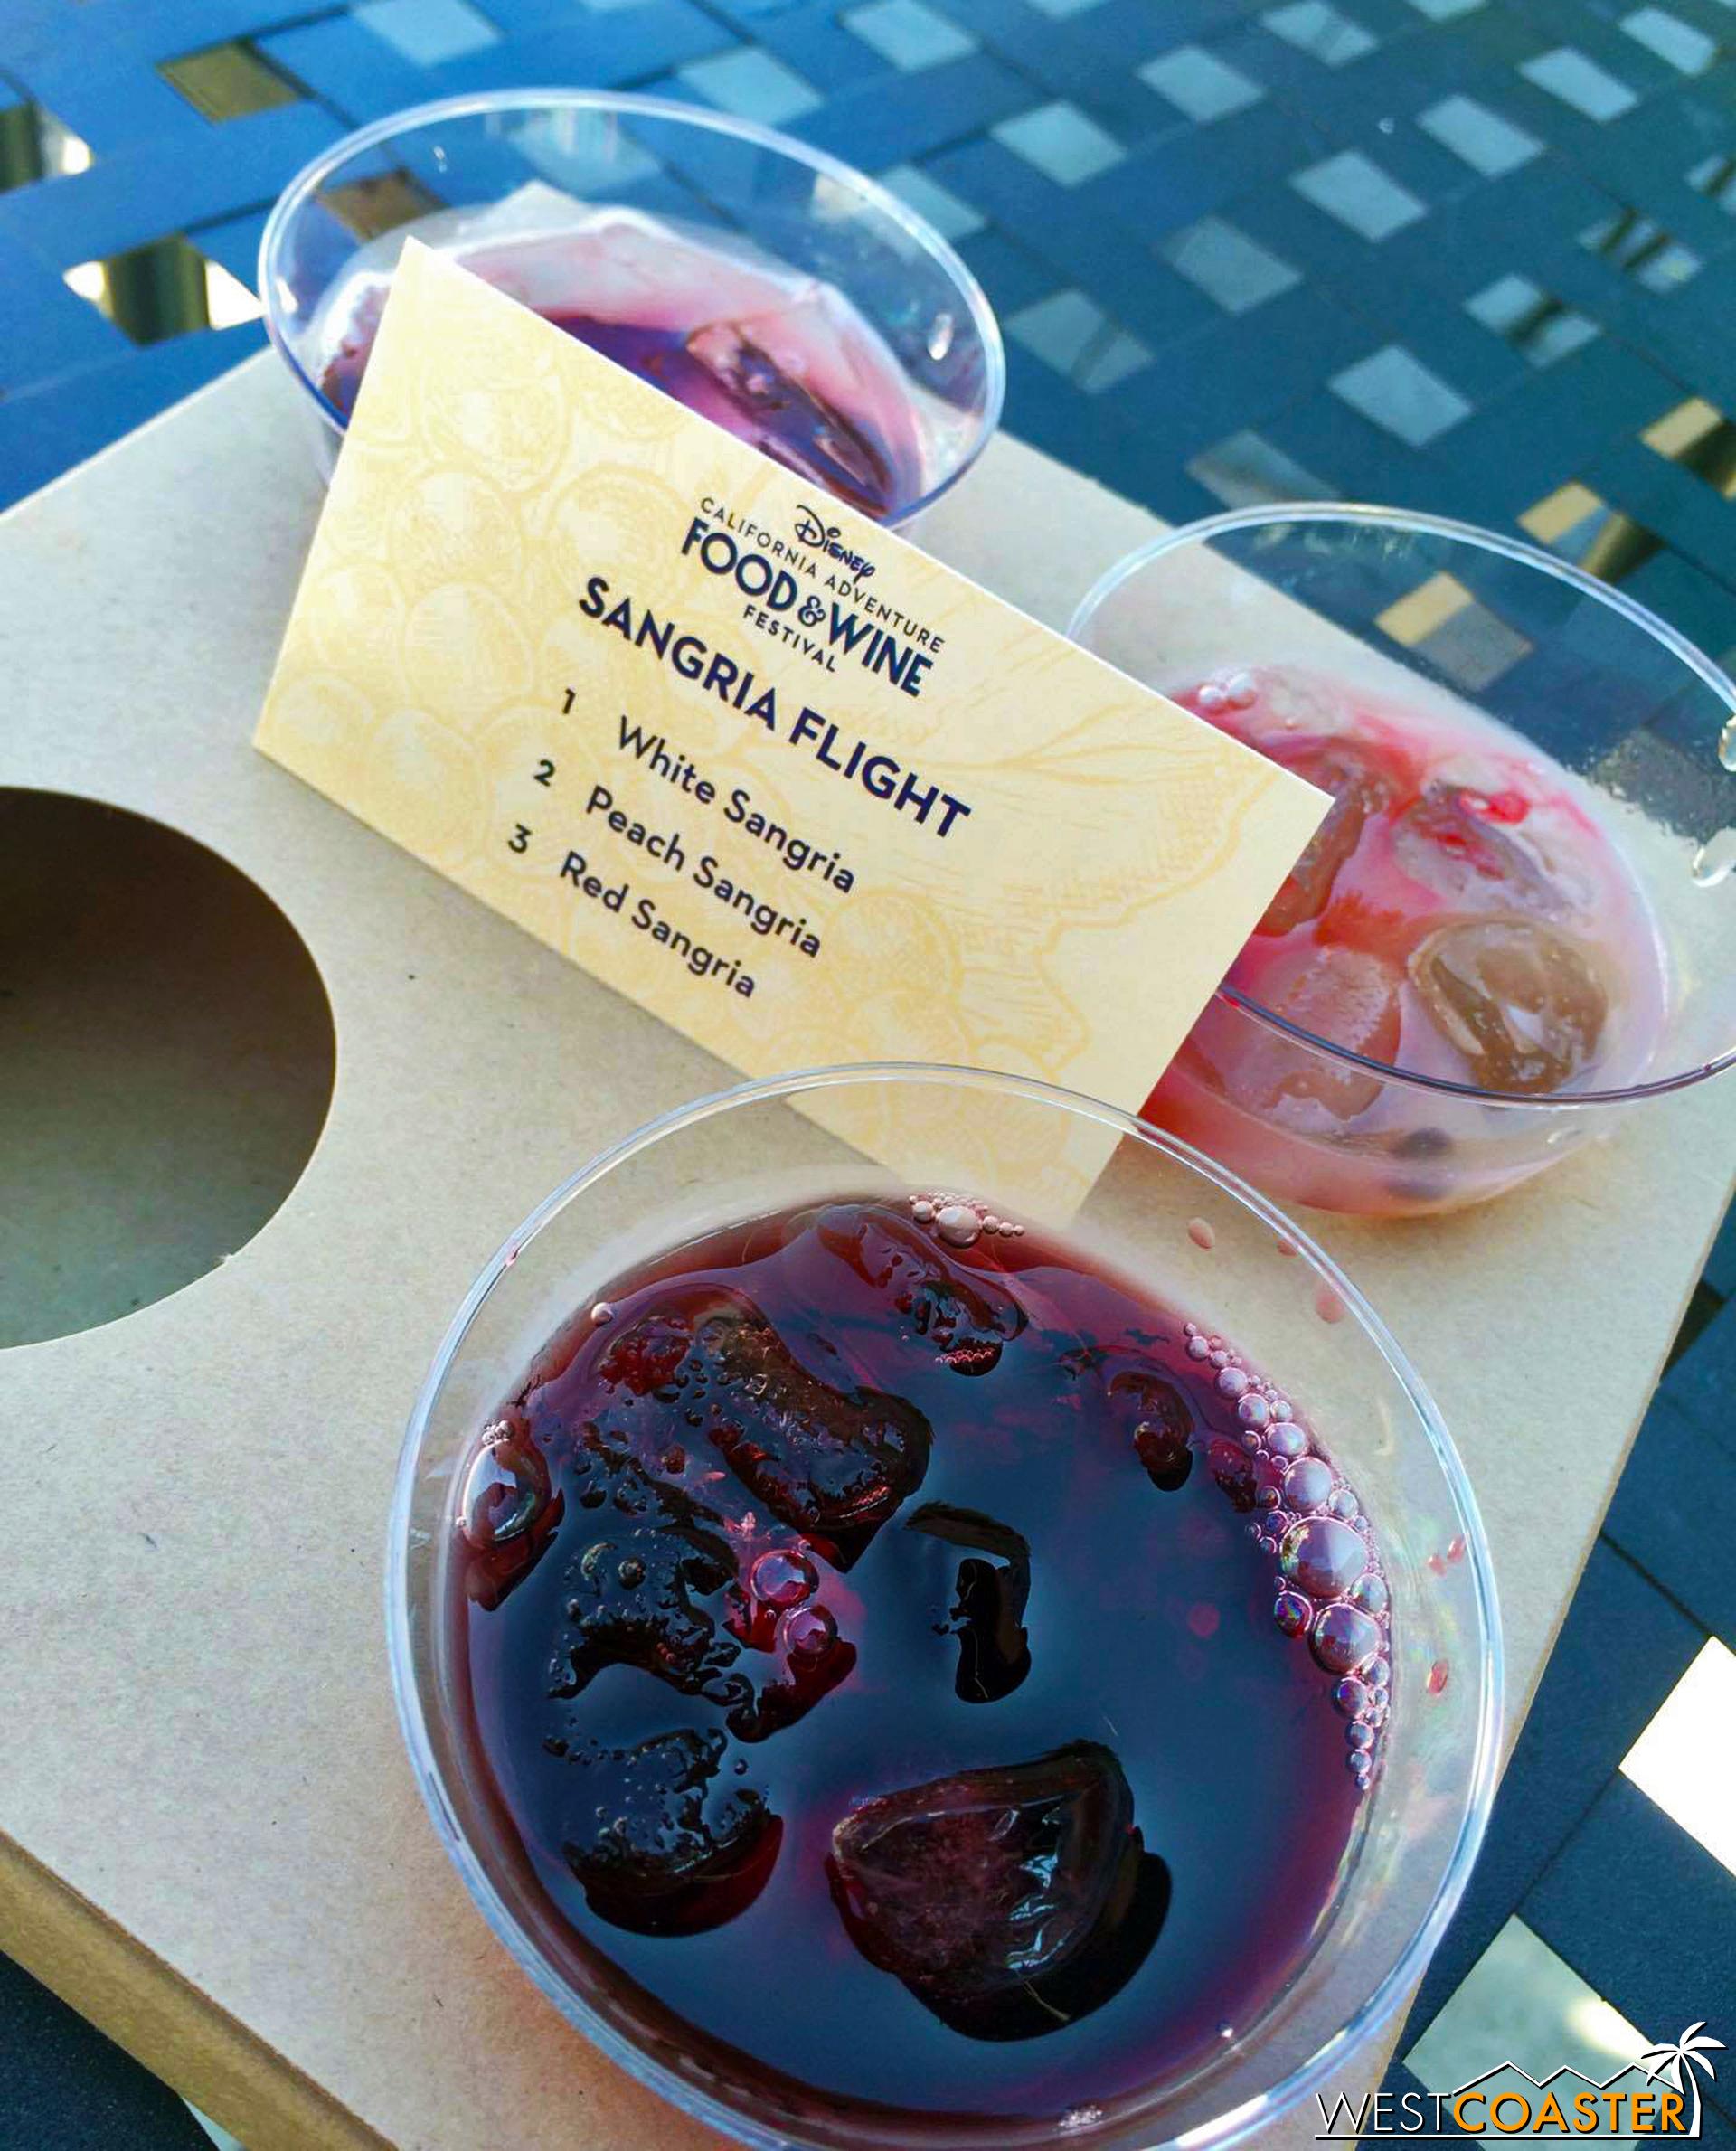 From Wineology:  Flight - Sangria   White Sangria, Peach Sangria, Red Sangria ($9.50)  (Photo Credit: Jessica S.)